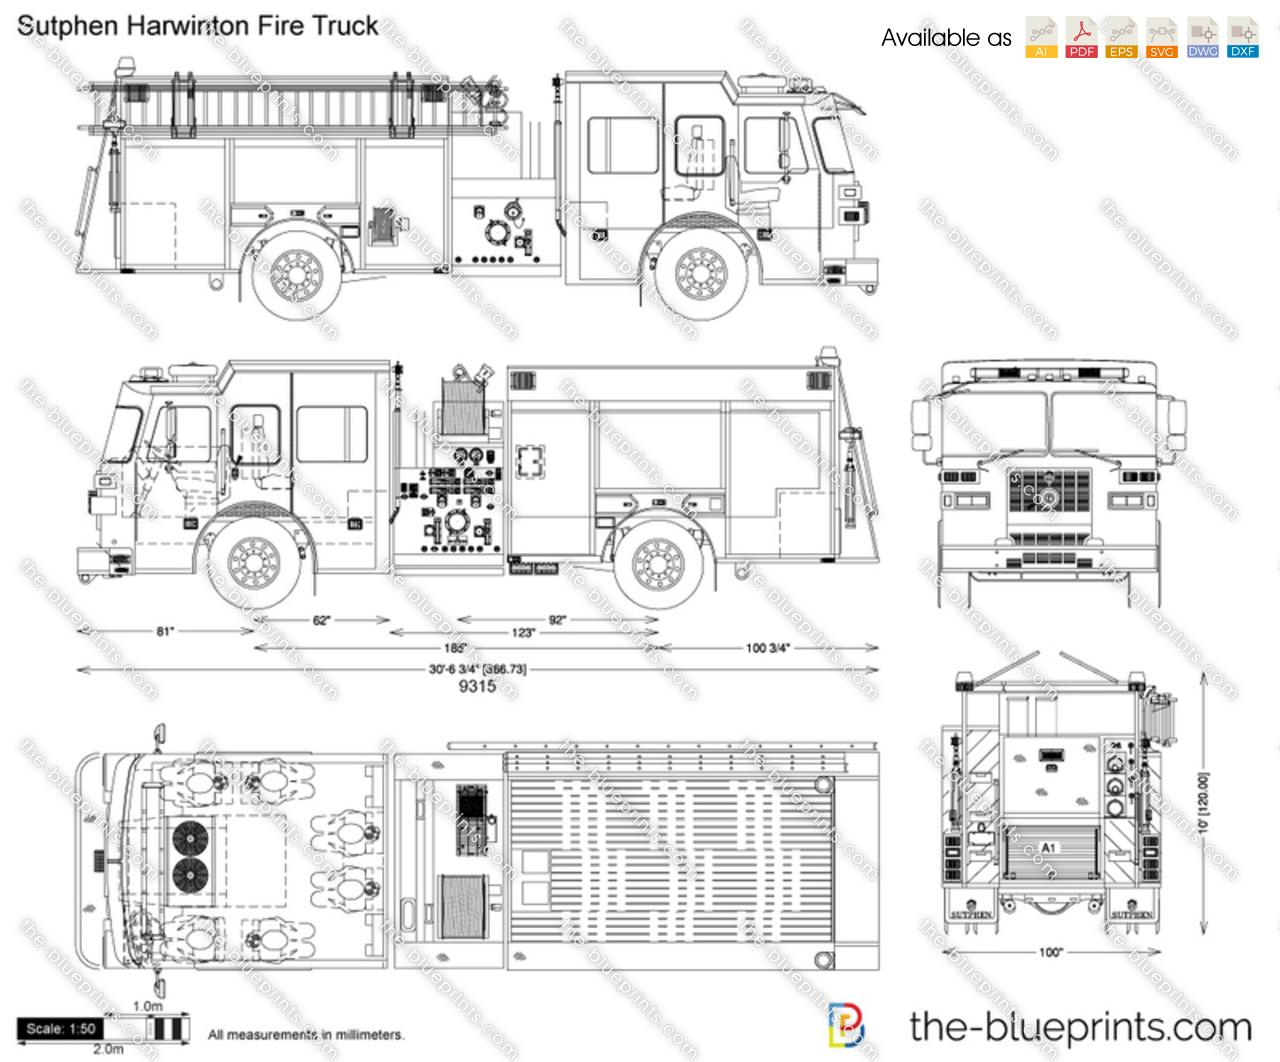 Sutphen Harwinton Fire Truck